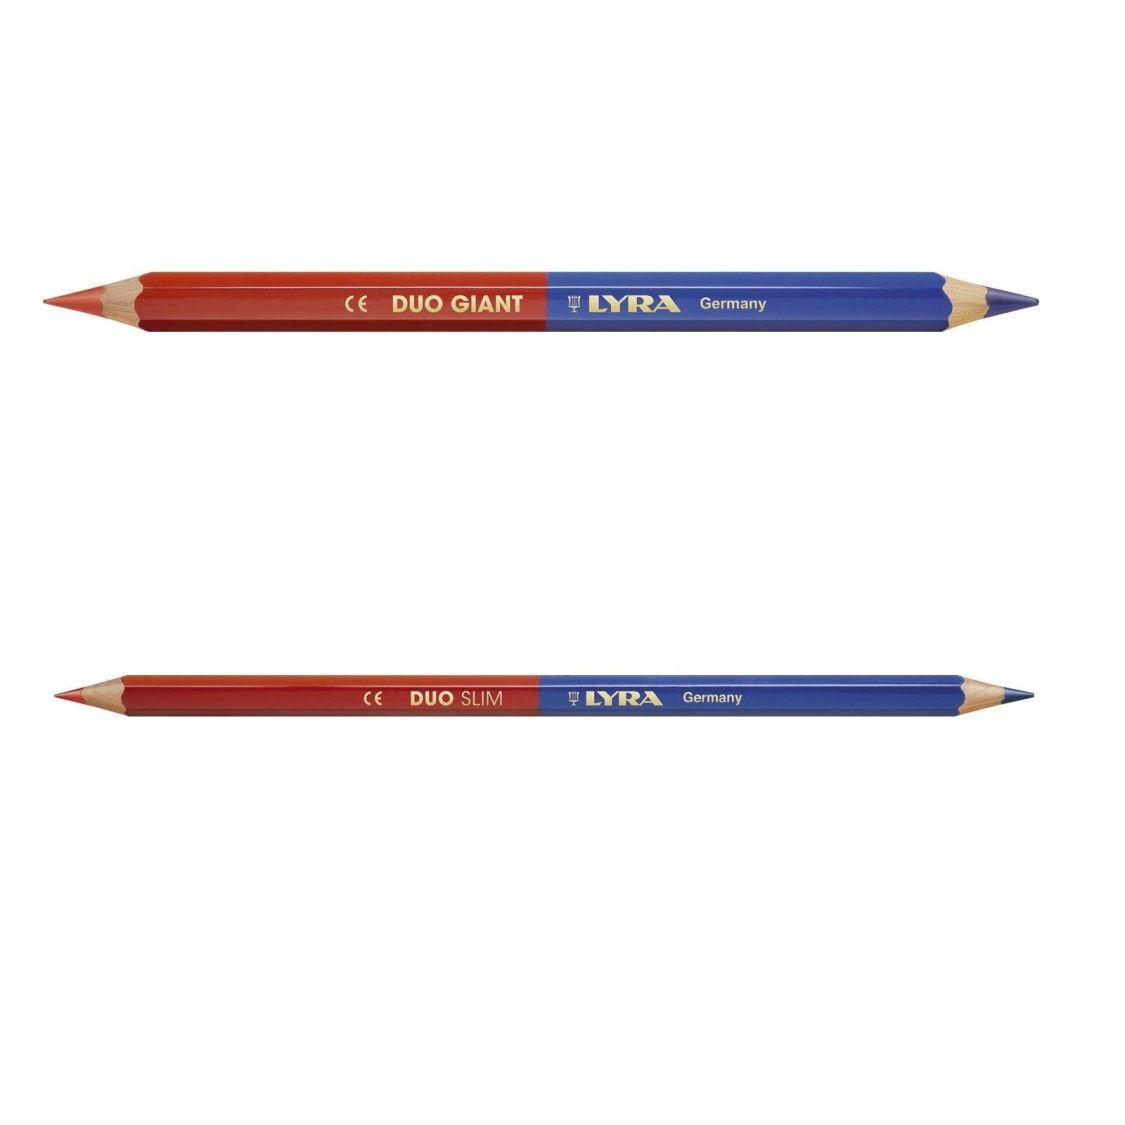 2 Stück LYRA Lehrerstift rot blau  JUMBO od SLIM  Korrekturstift  Lehrer